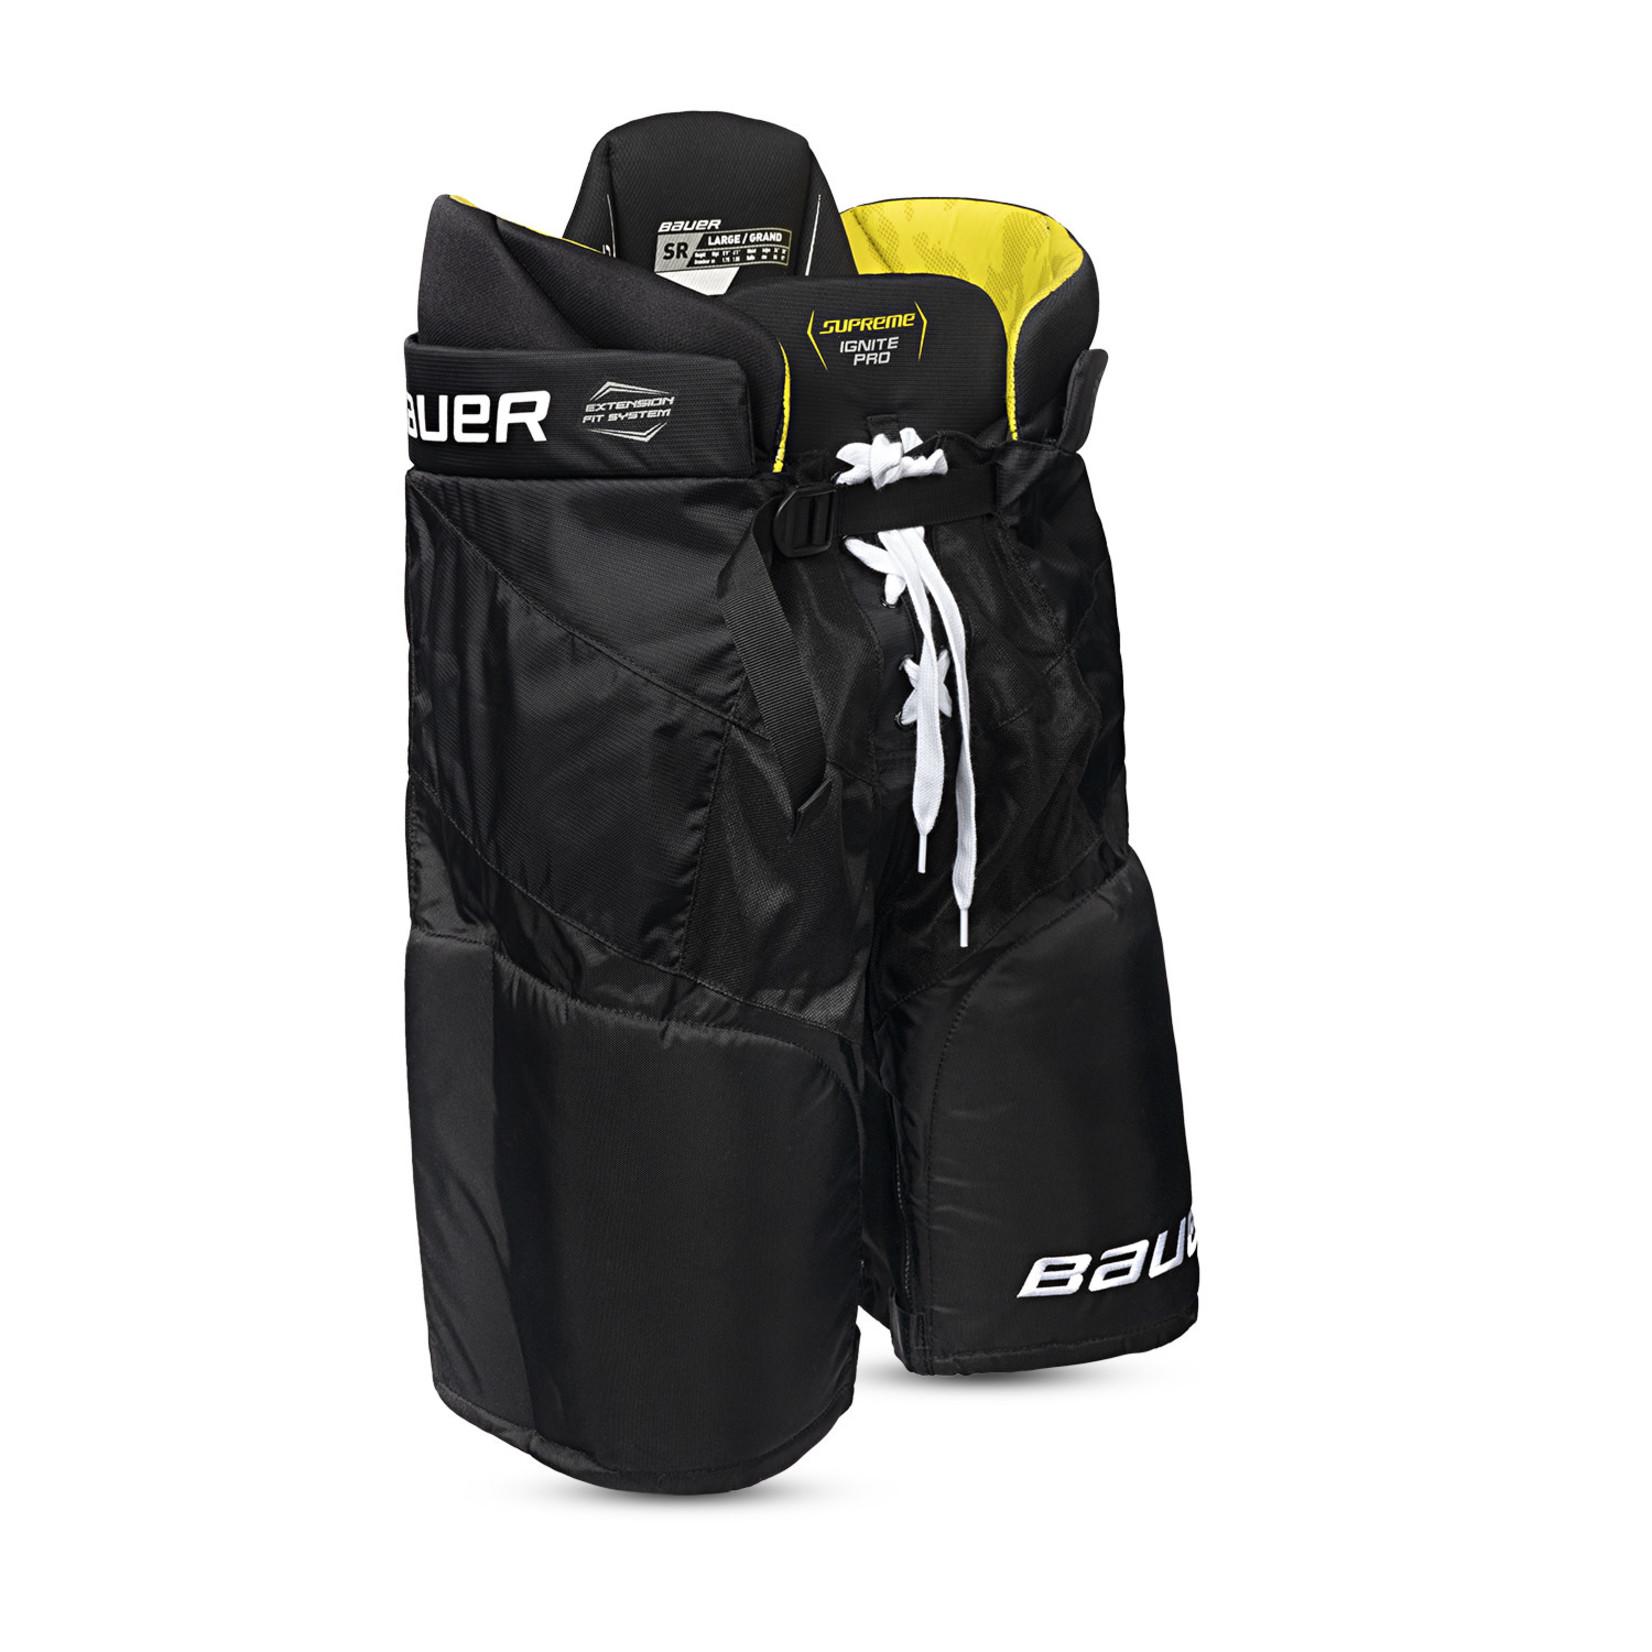 Bauer Bauer Hockey Pants, Supreme Ignite Pro, Junior